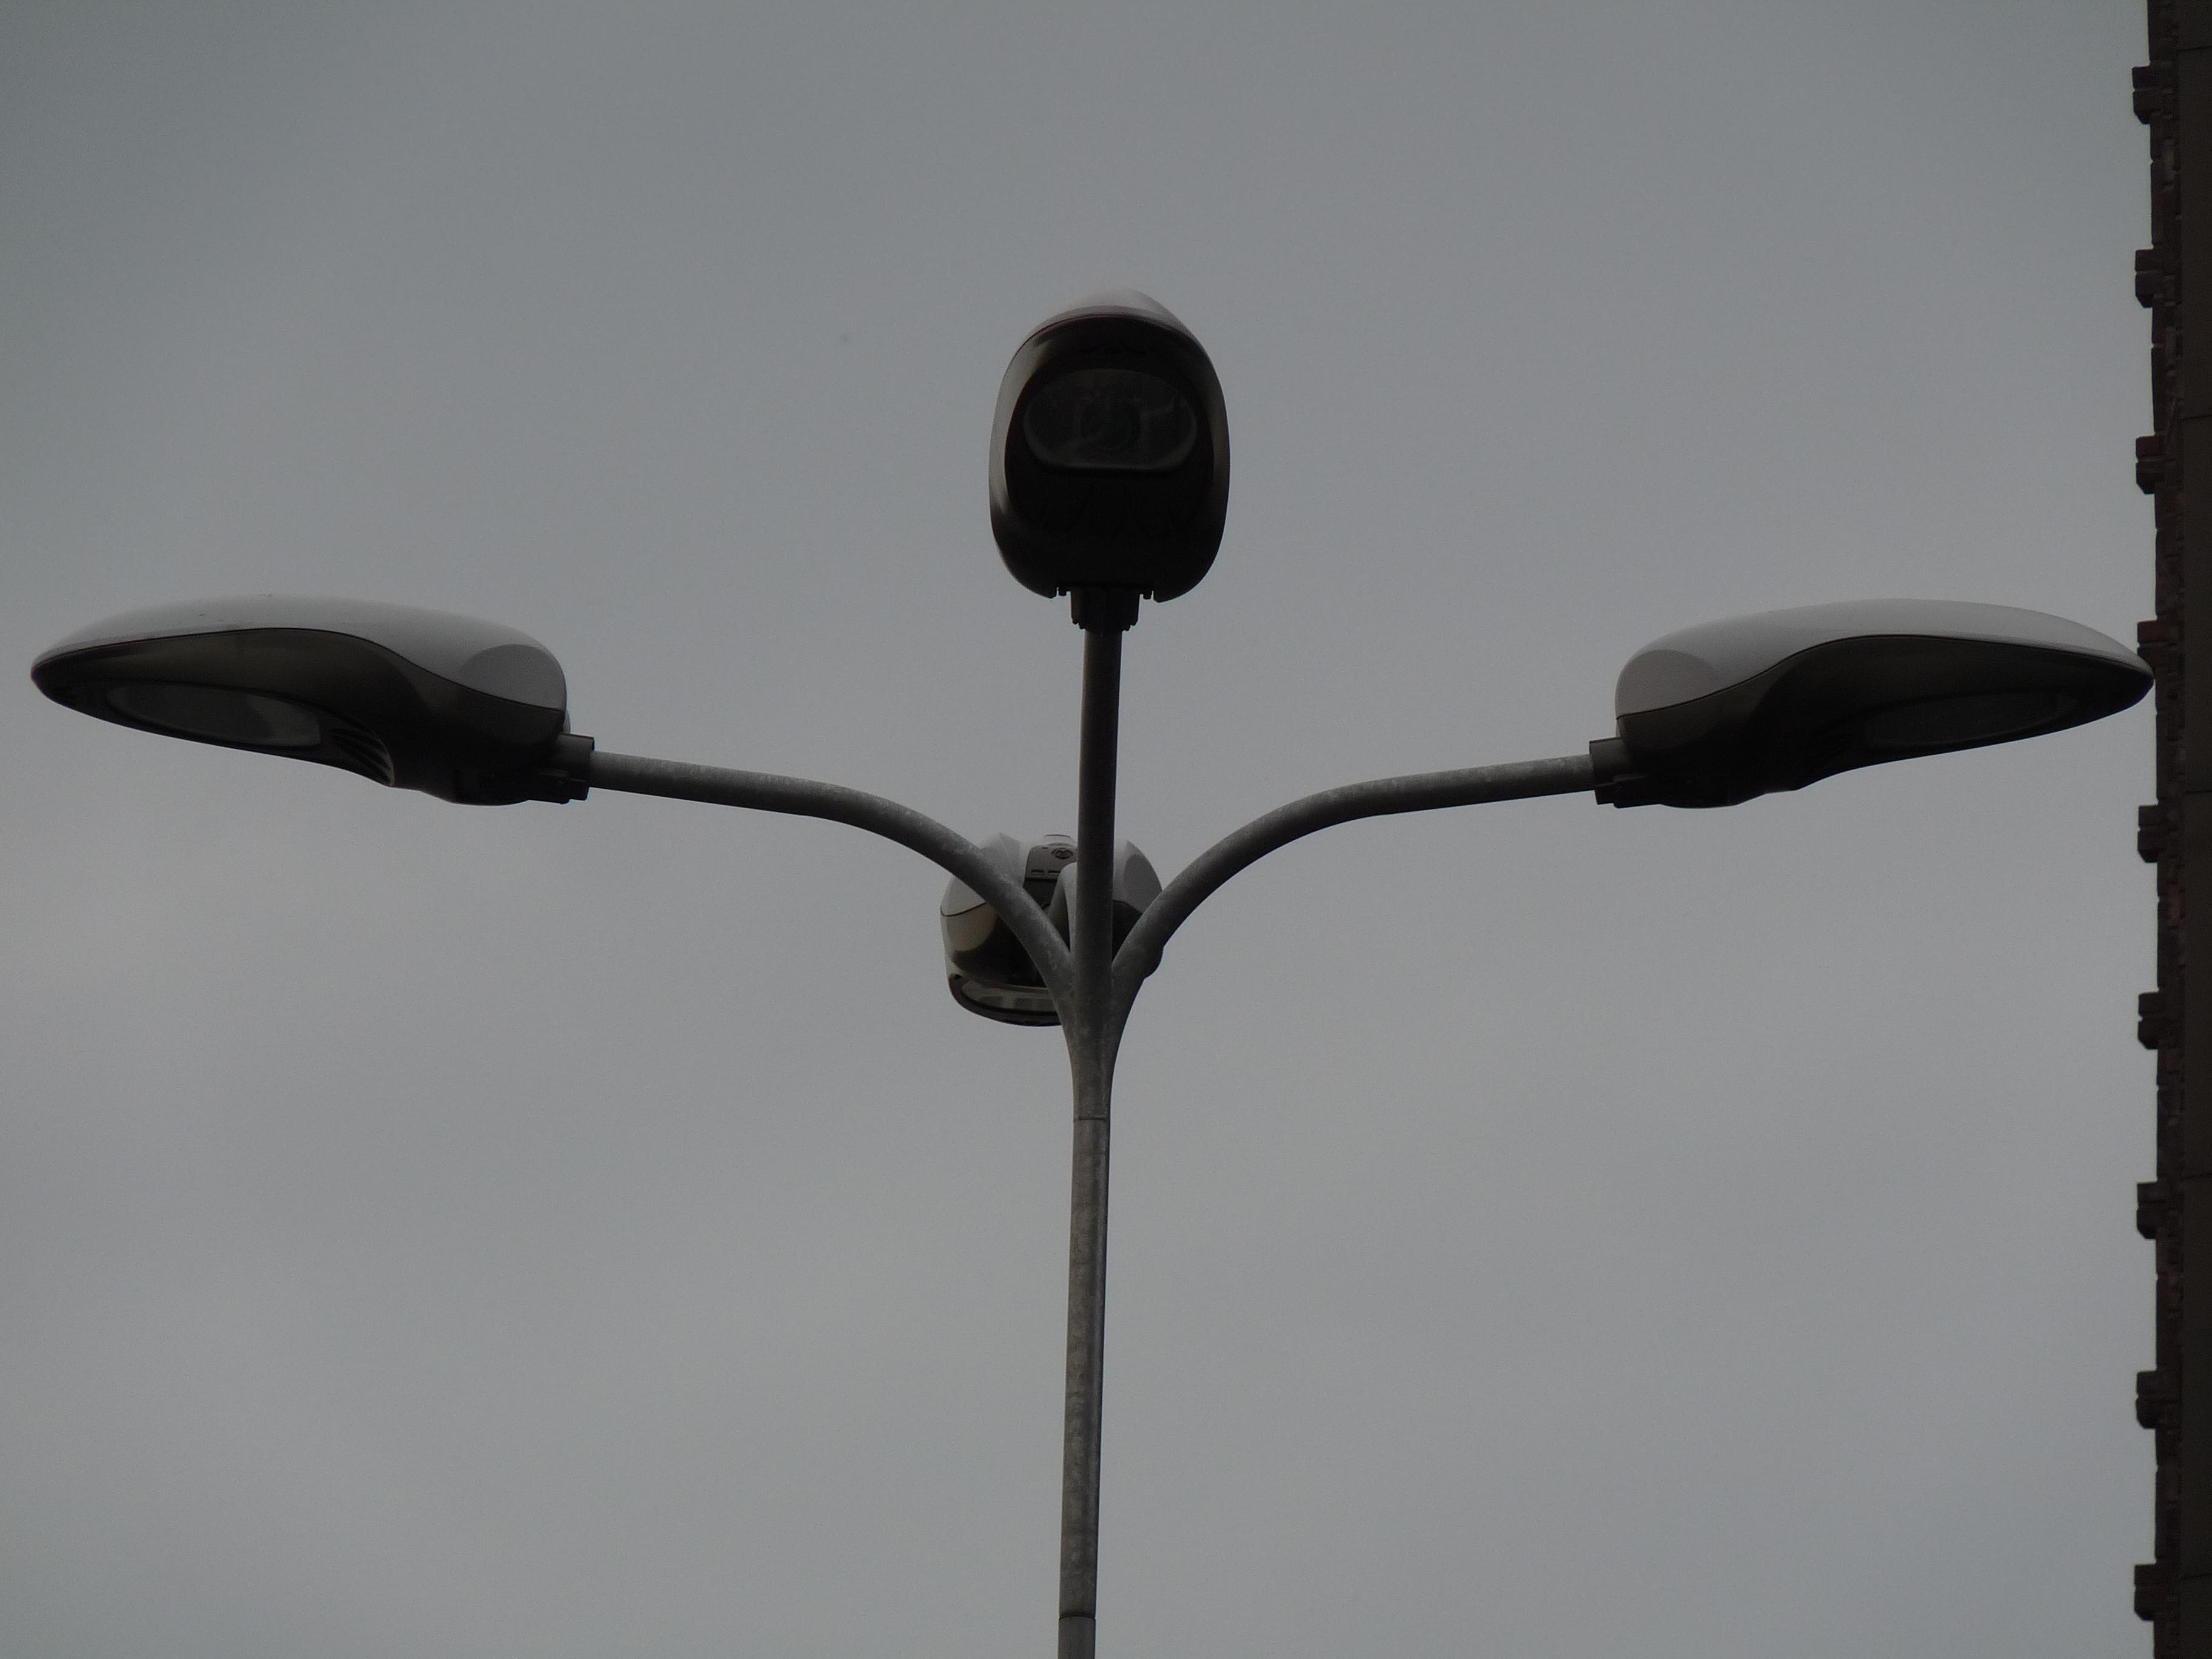 File:Modern streetlamps in Tallinn.JPG - Wikimedia Commons for Modern Street Lamps  67qdu